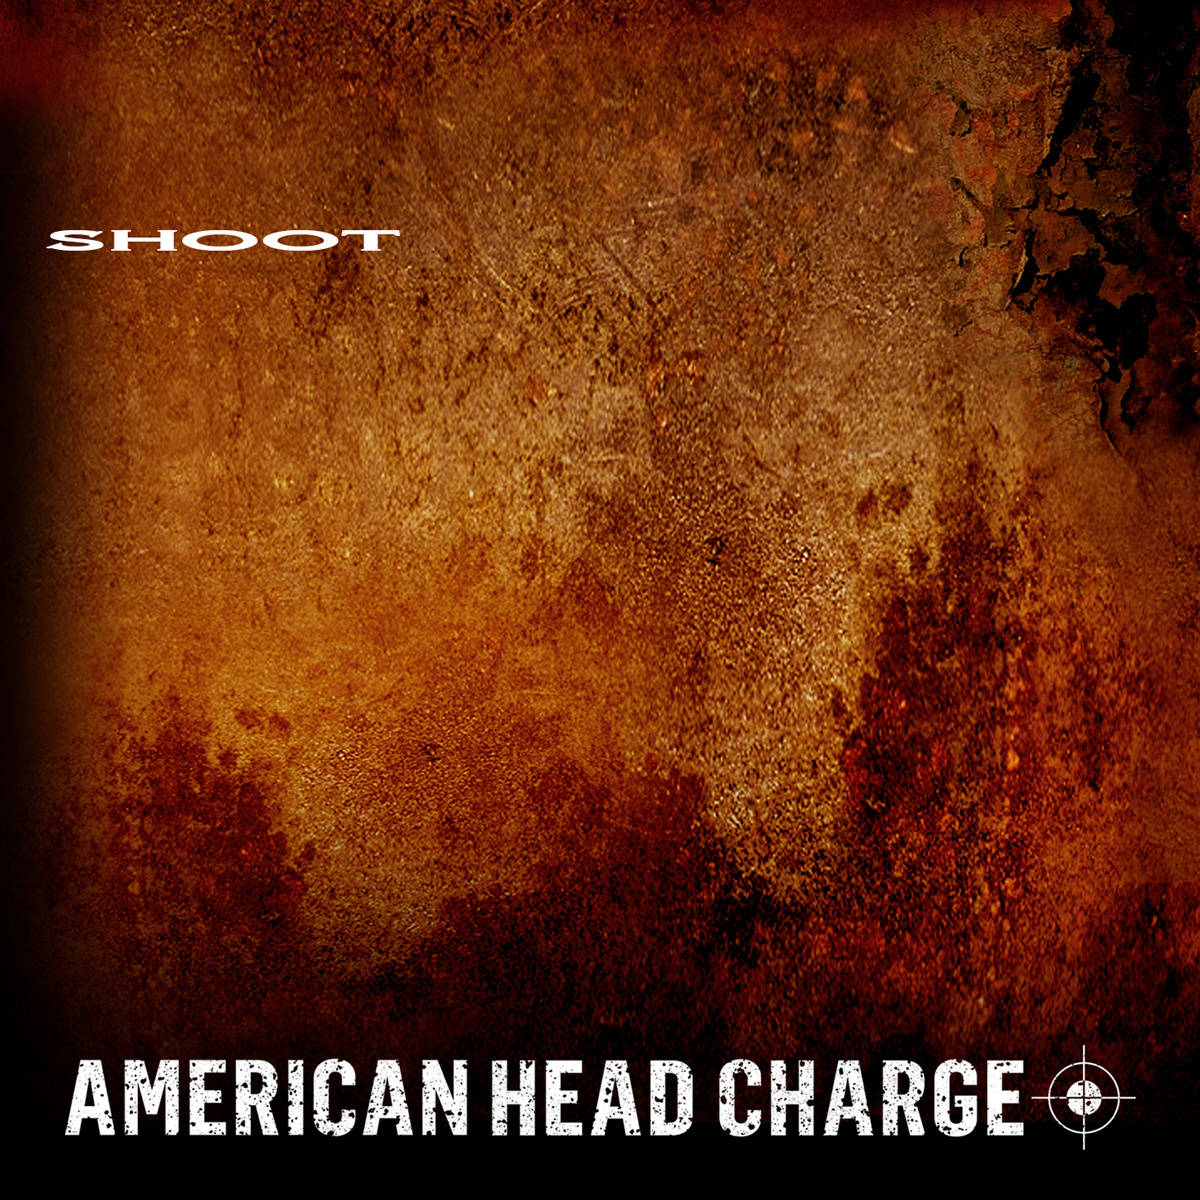 American Head Charge - Shoot EP